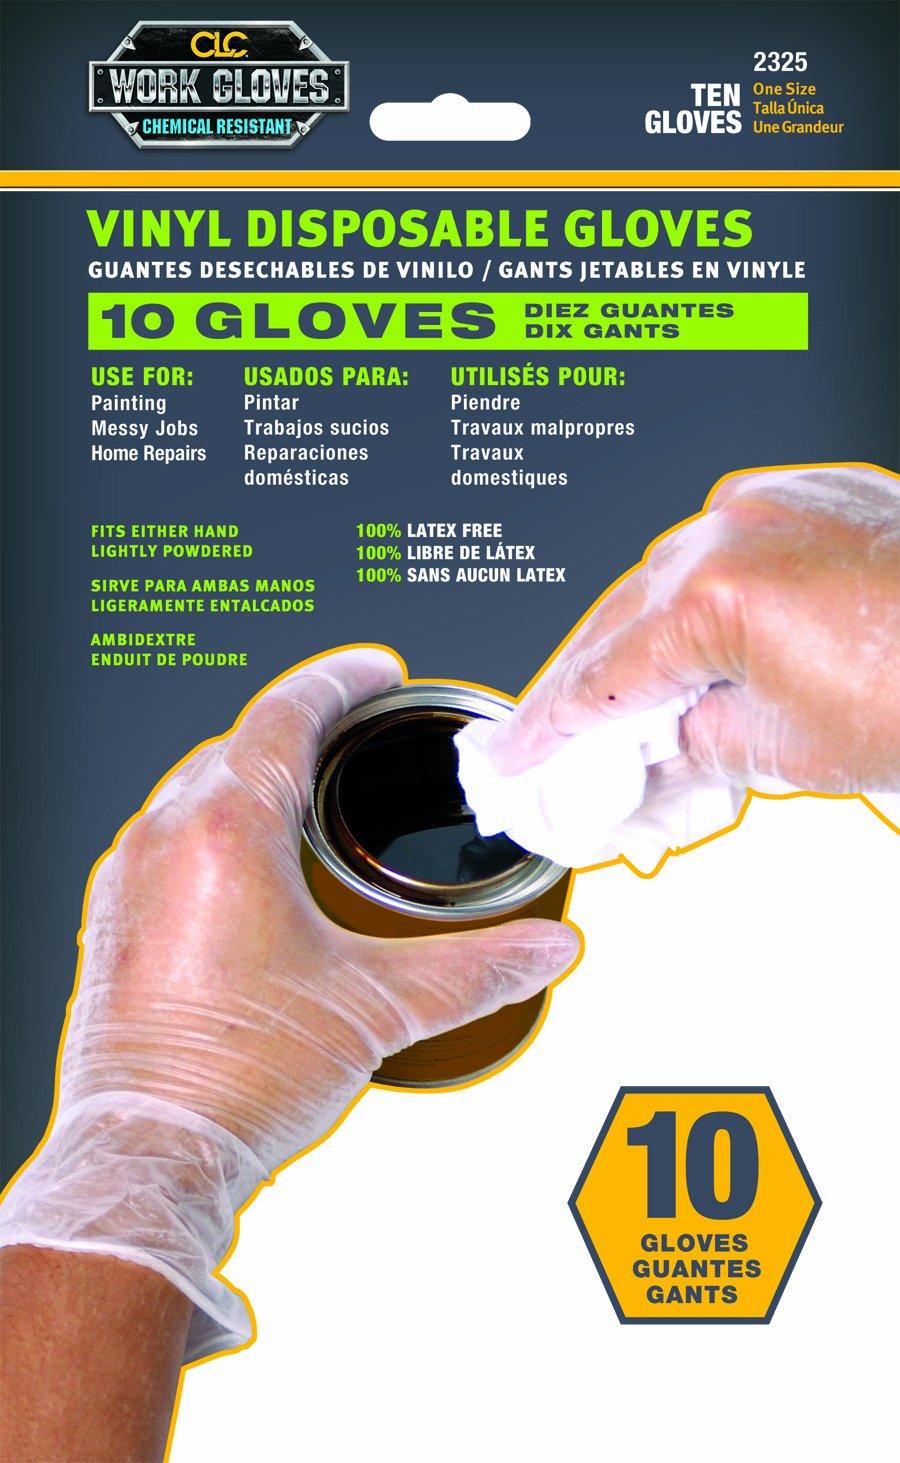 Custom Leathercraft 2325 Vinyl Disposable Gloves, Bag of 10